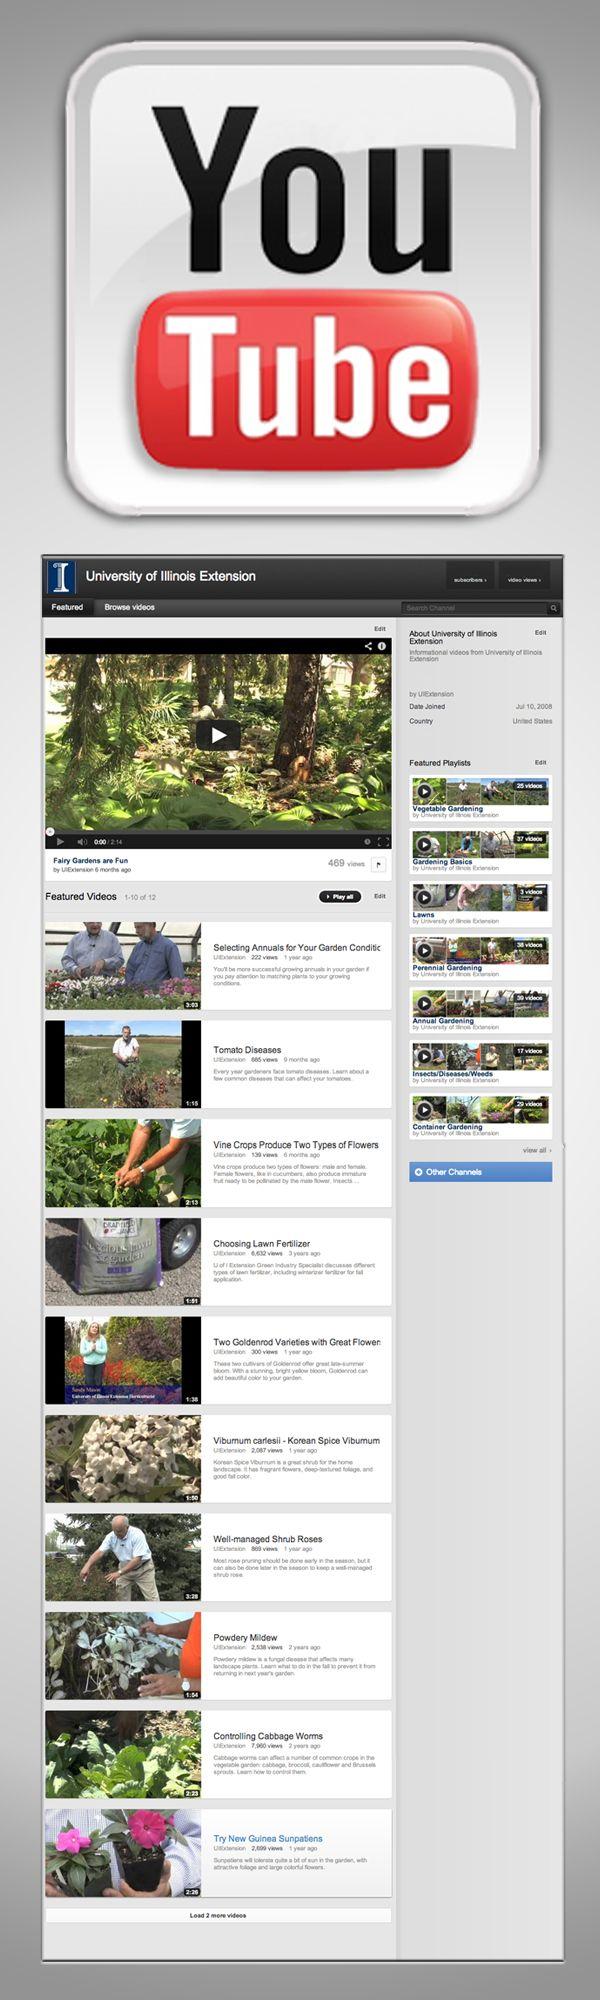 92b96e2a26d8a0bb942846fb05999d39 - University Of Illinois Extension Master Gardener Program